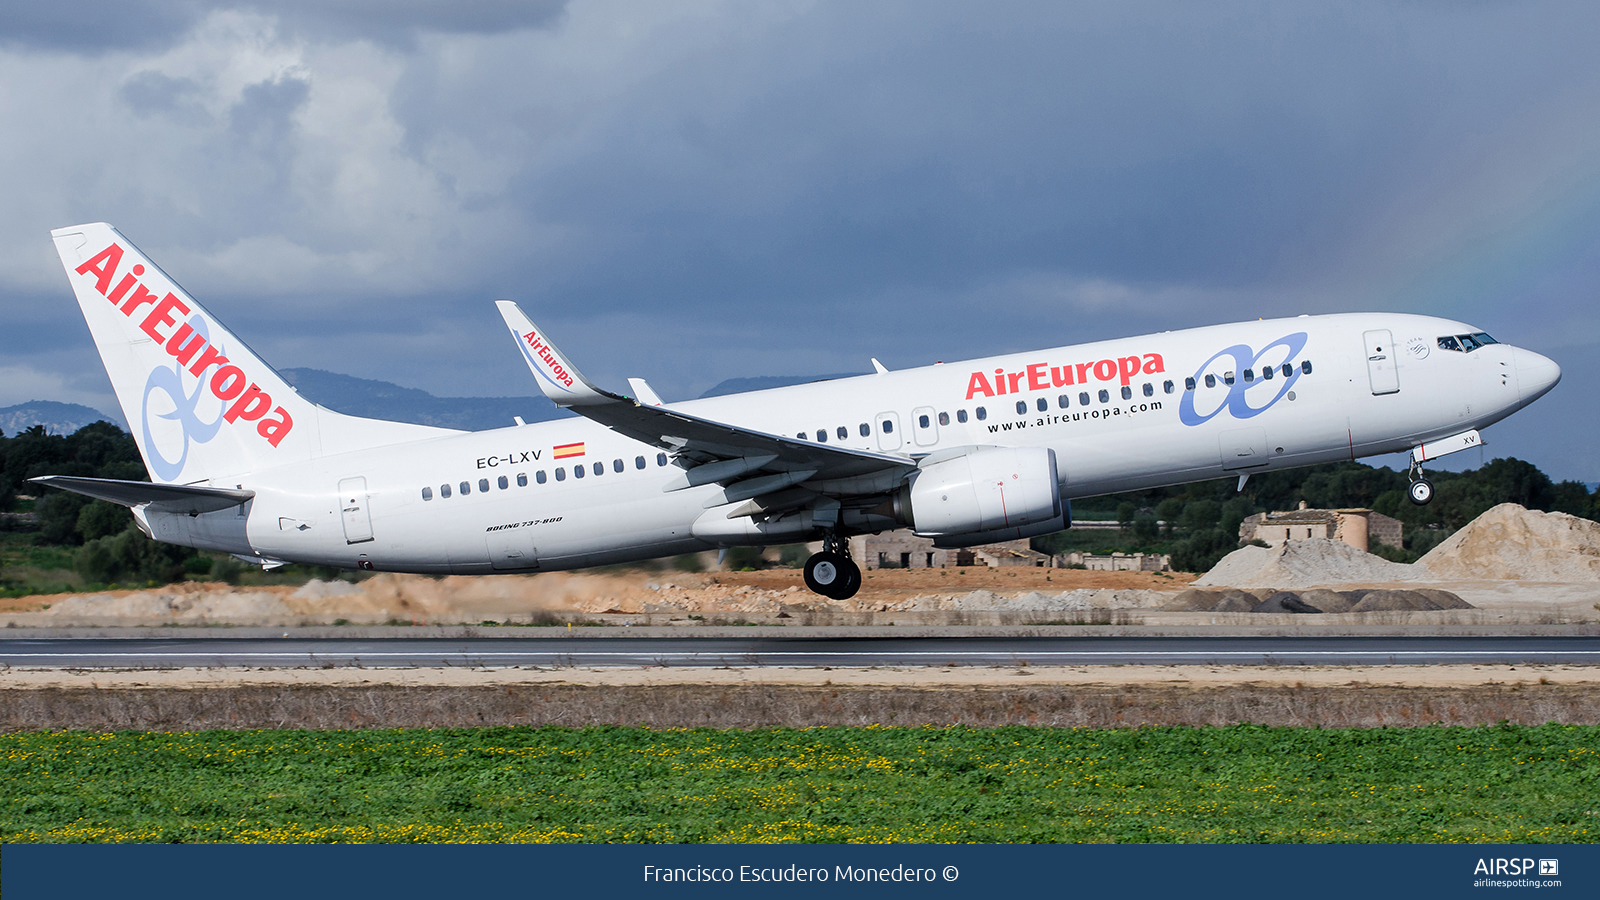 Air EuropaBoeing 737-800EC-LXV